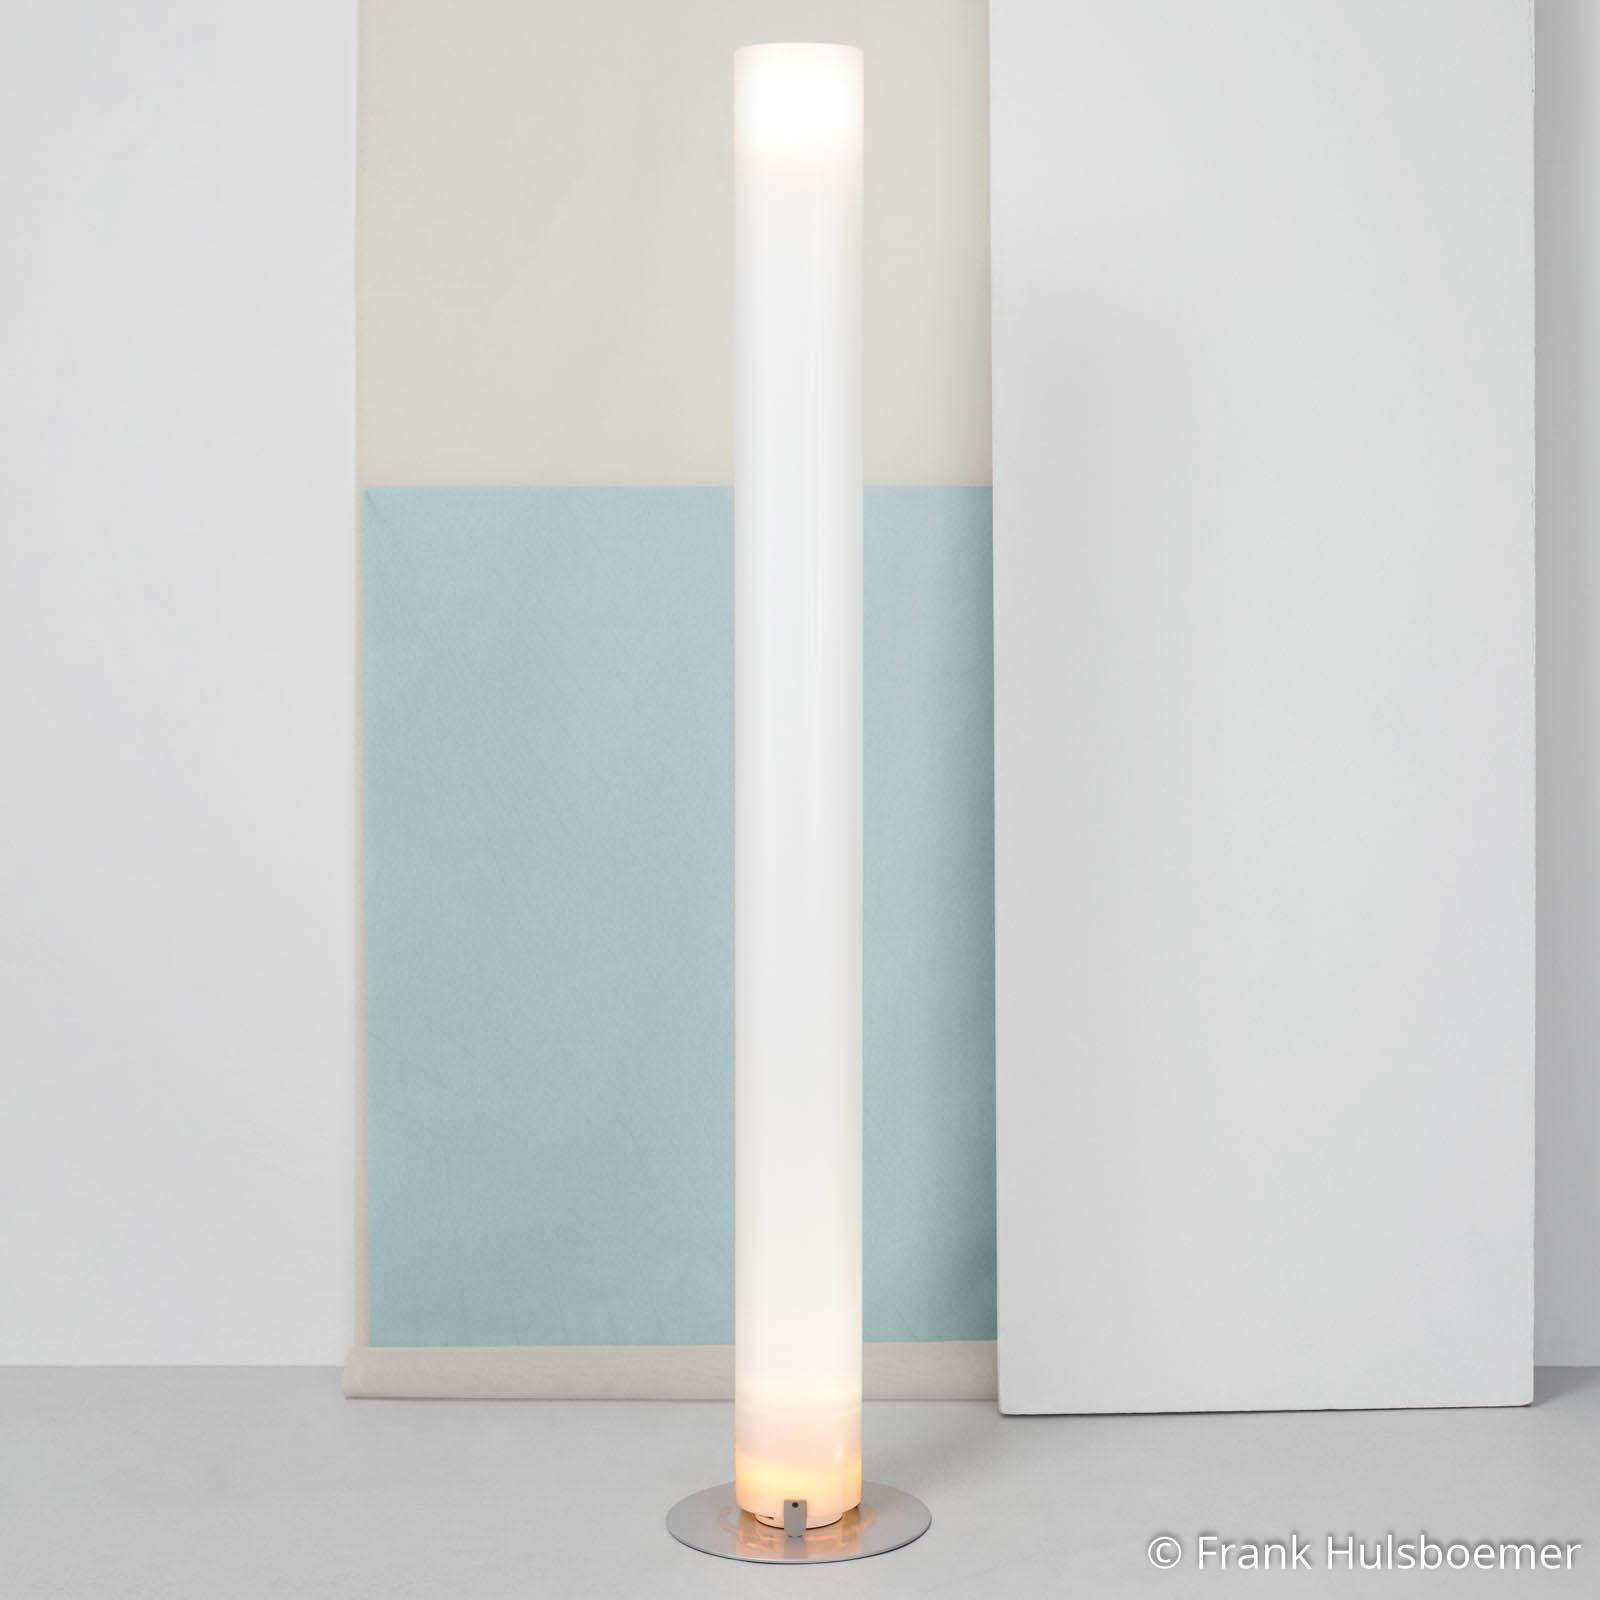 Cylinderformet STYLOS standerlampe